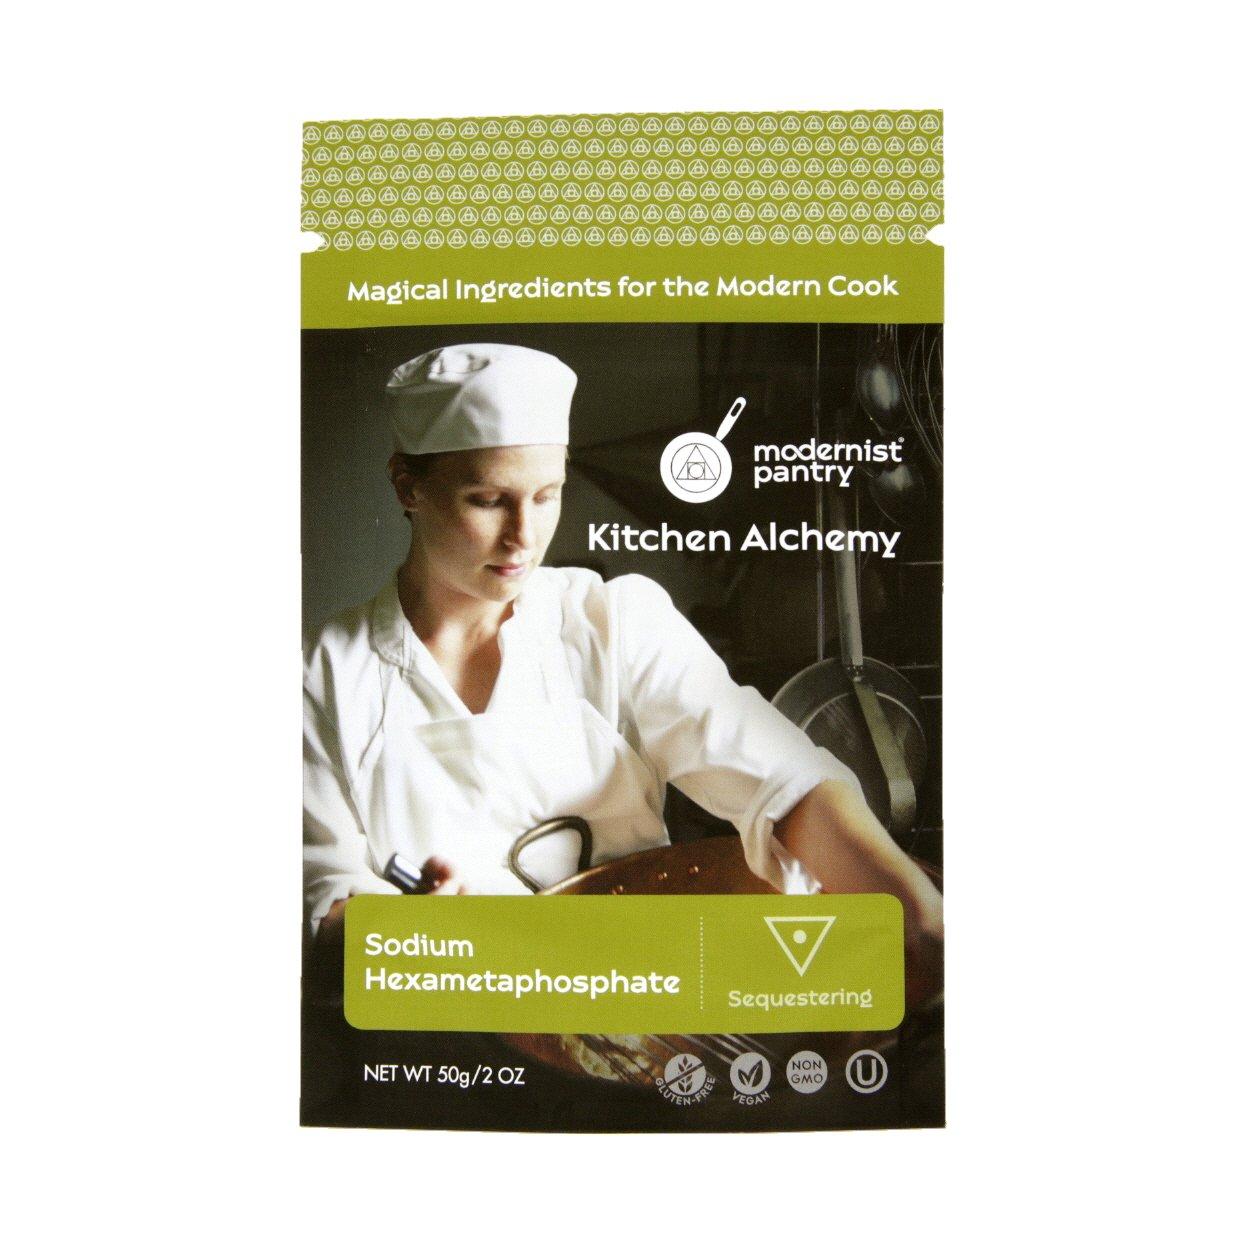 Food Grade Sodium Hexametaphosphate (Molecular Gastronomy) ⊘ Non-GMO ☮ Vegan ✡ OU Kosher Certified - 50g/2oz